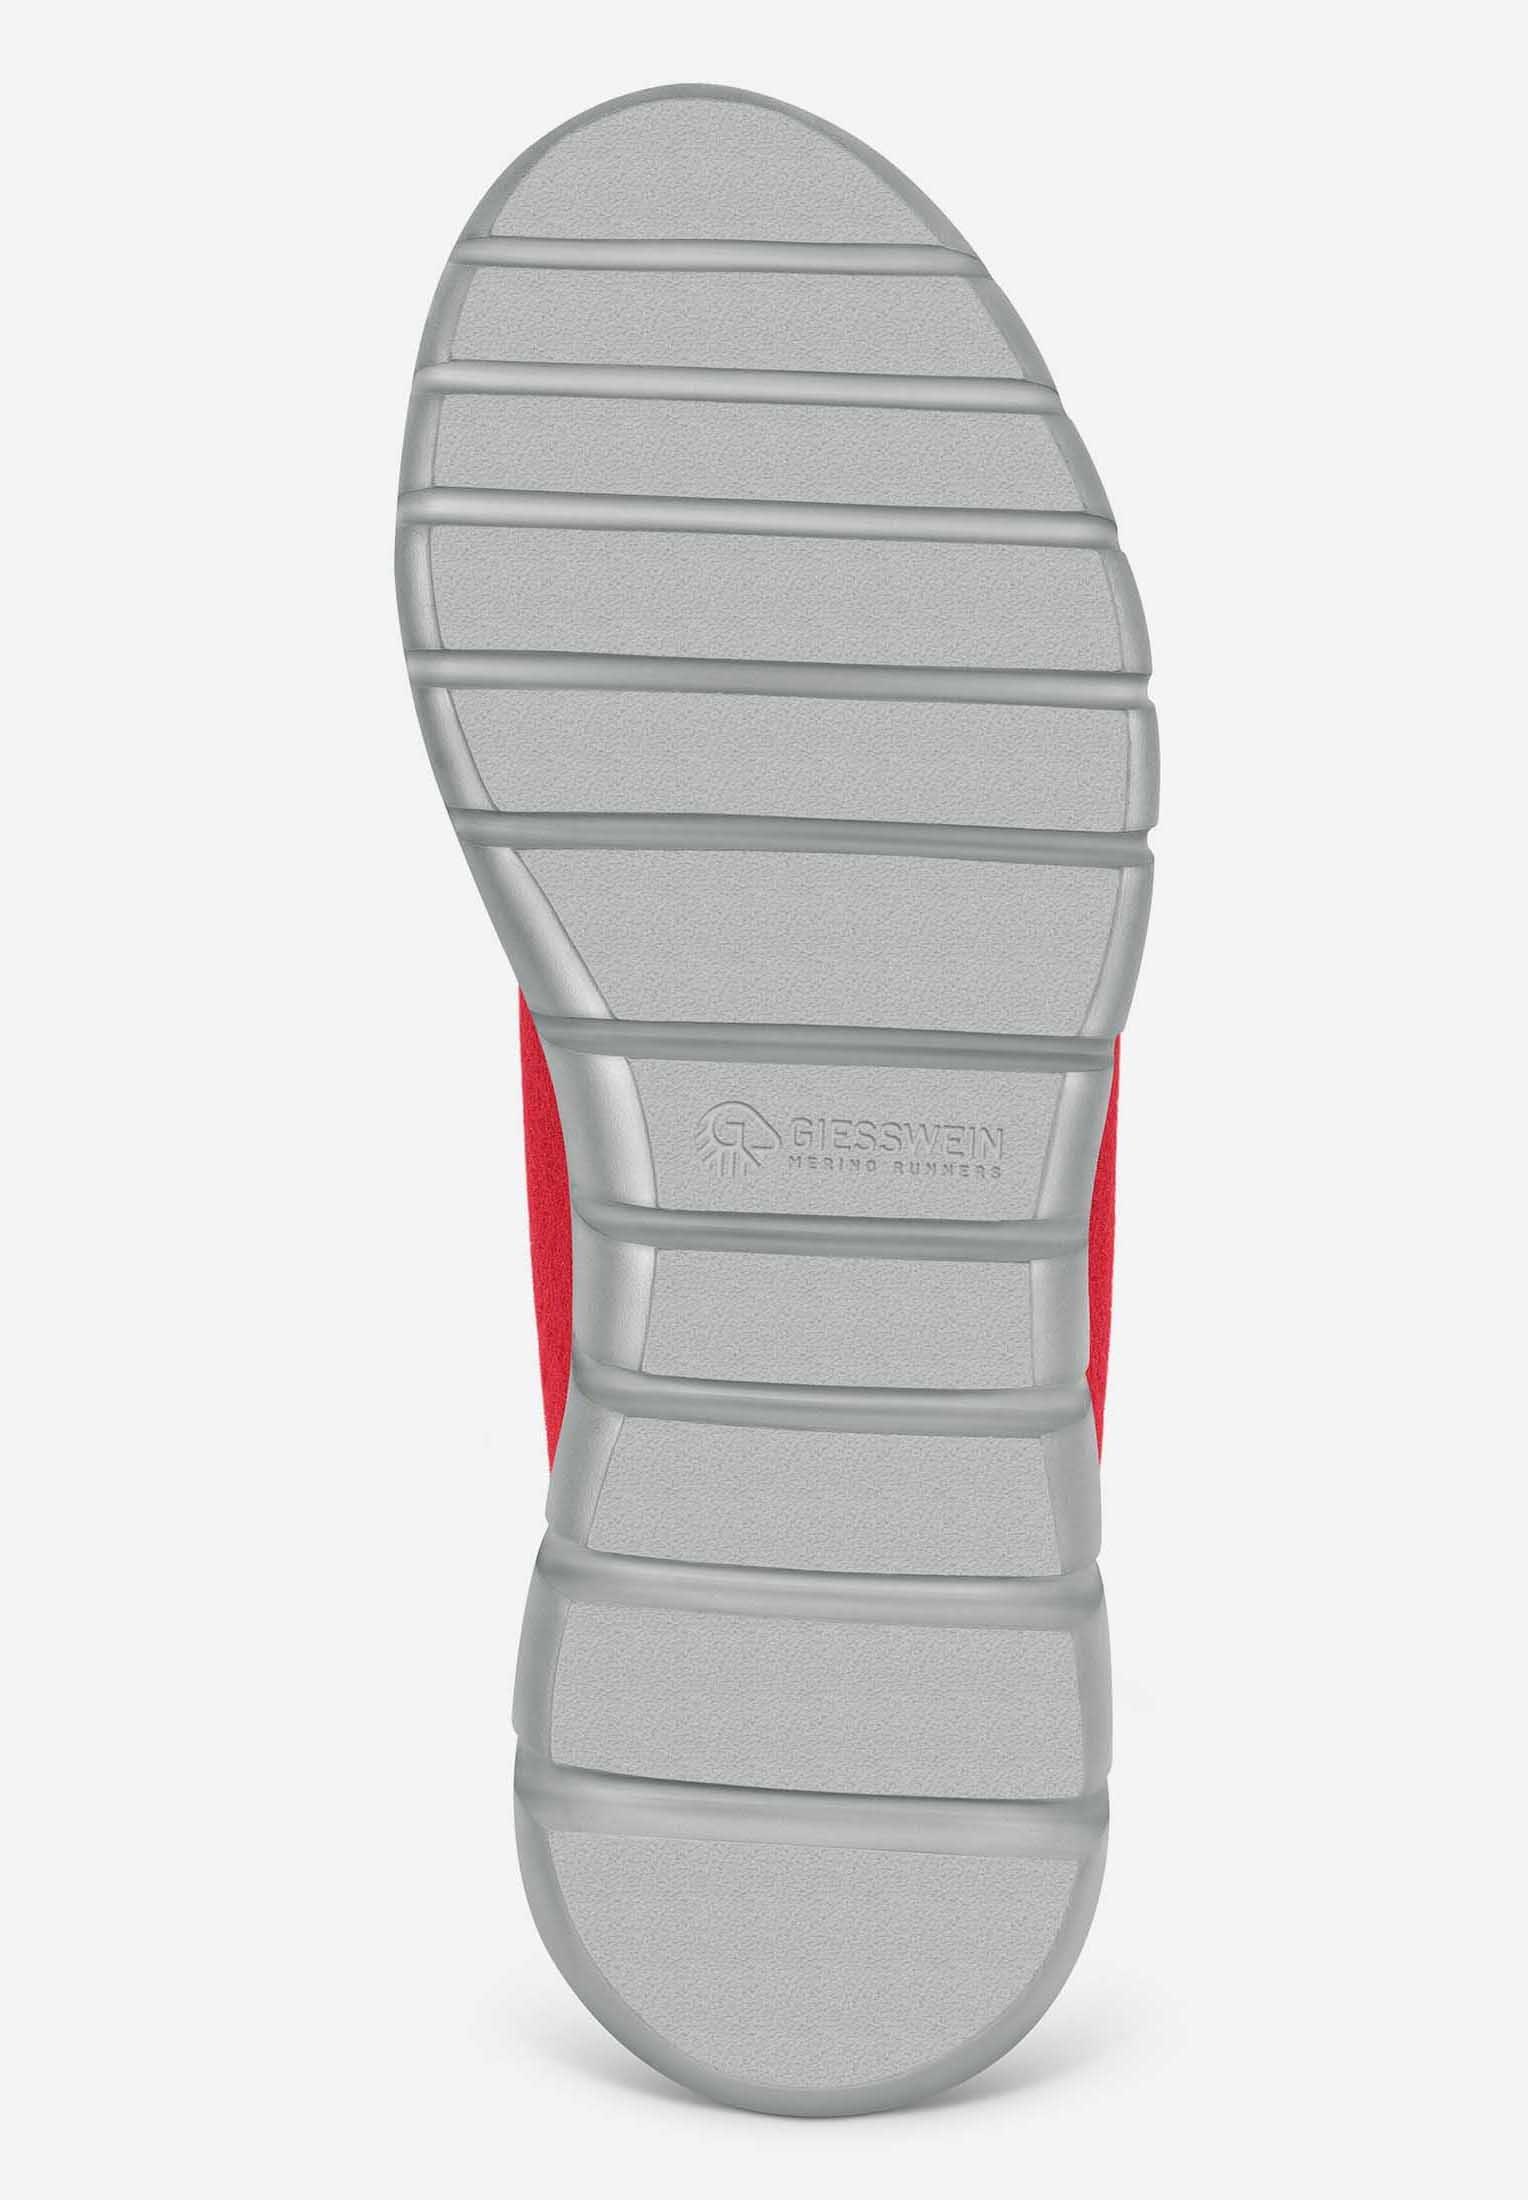 Giesswein MERINO RUNNERS - Sneaker low - red - Black Friday